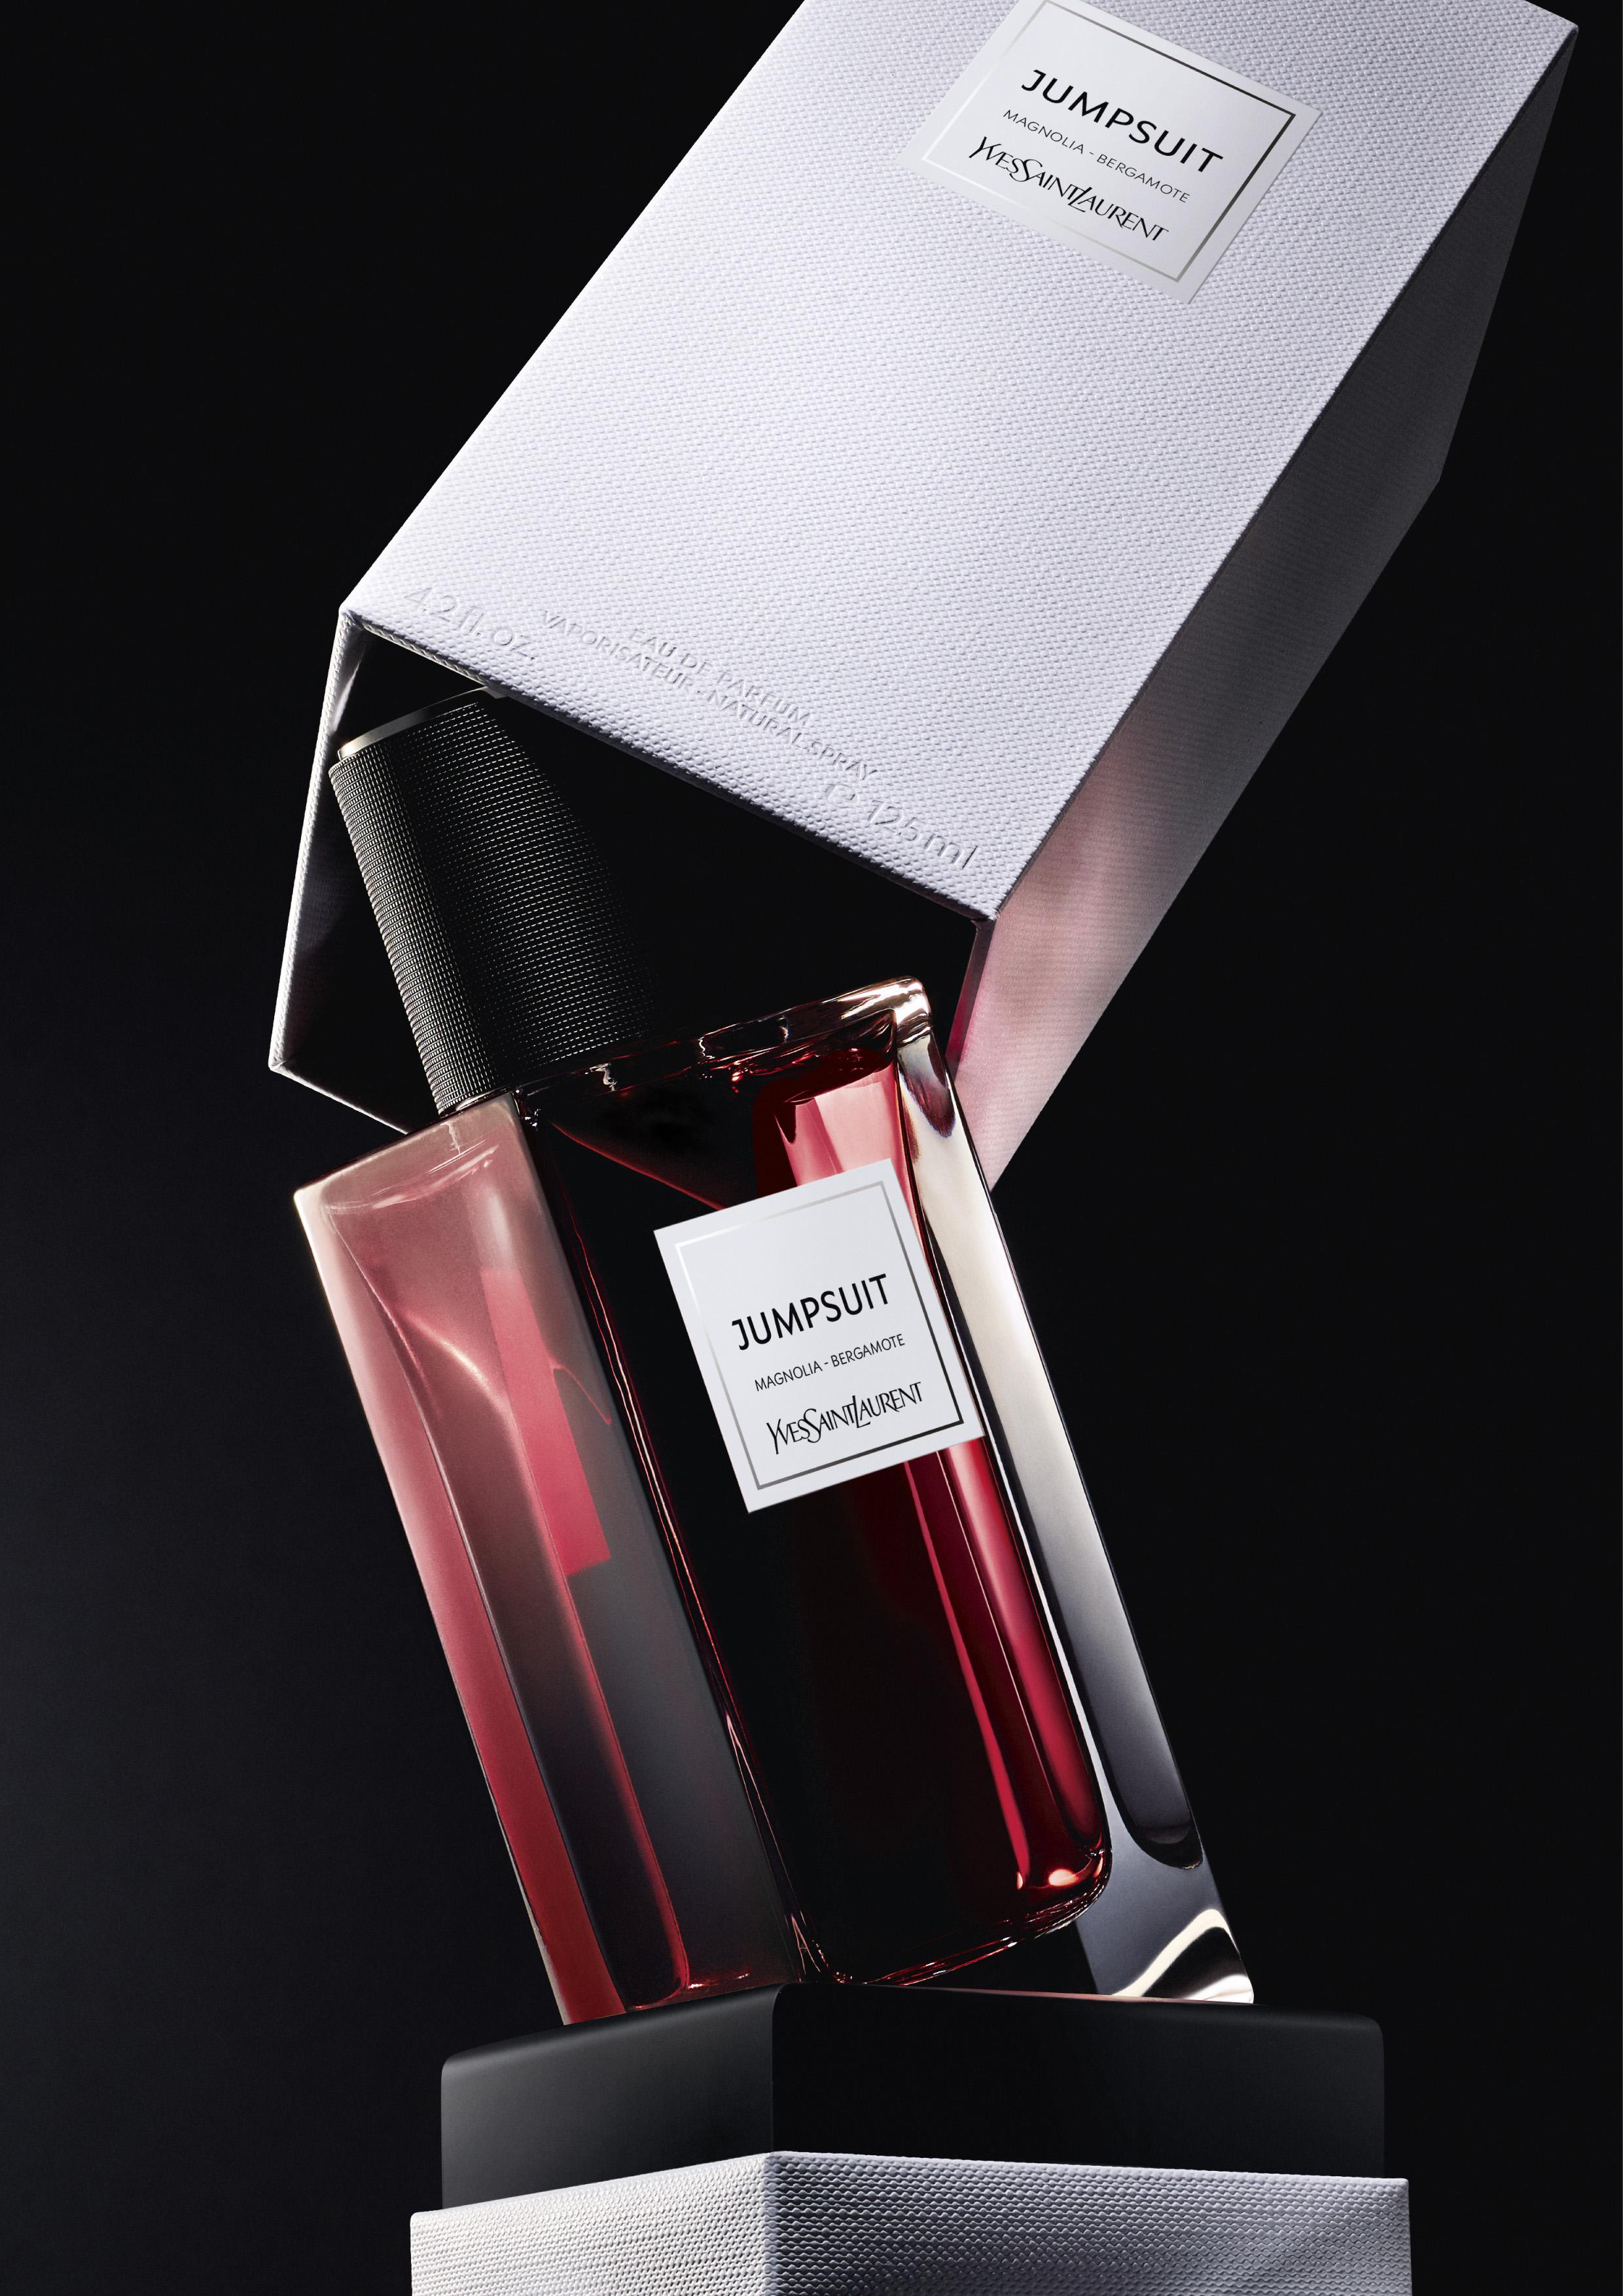 contemporain lvp jumpsuit vertical ysl - Yves Saint Laurent presenta  dos nuevas fragancias :  CAPELINE y JUMPSUIT